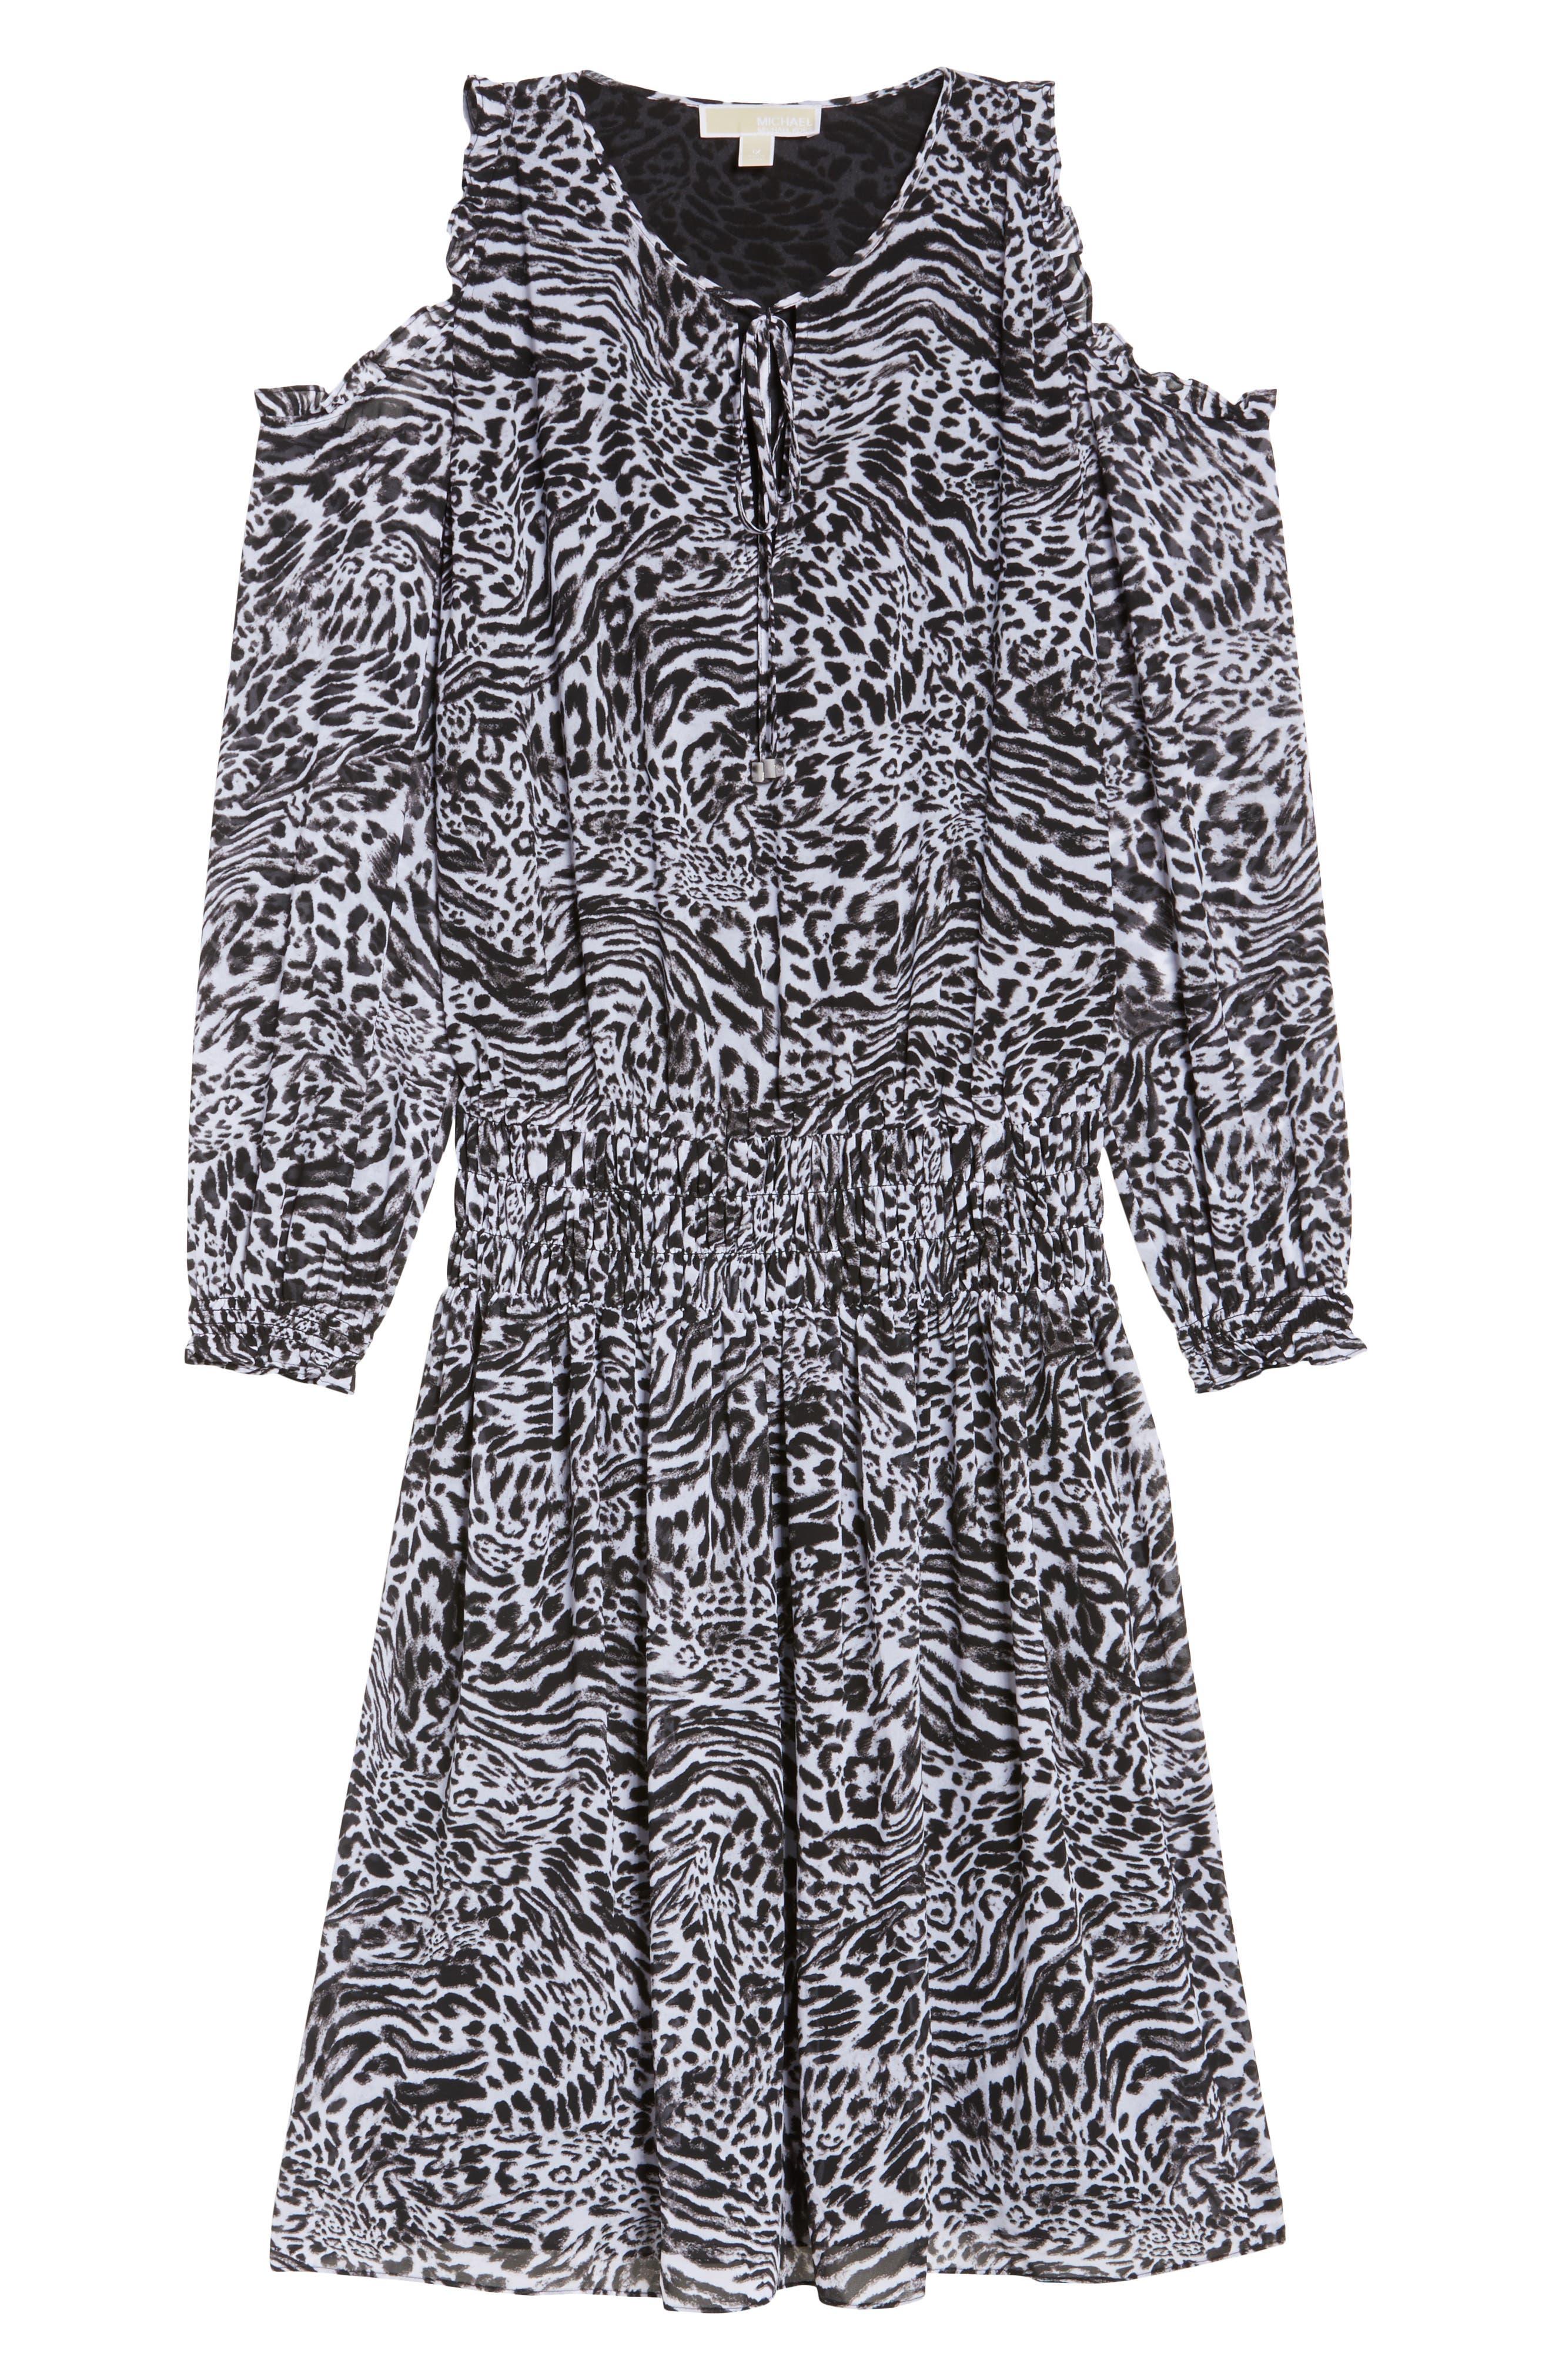 Big Cat Print Cold Shoulder Dress,                             Alternate thumbnail 6, color,                             Black